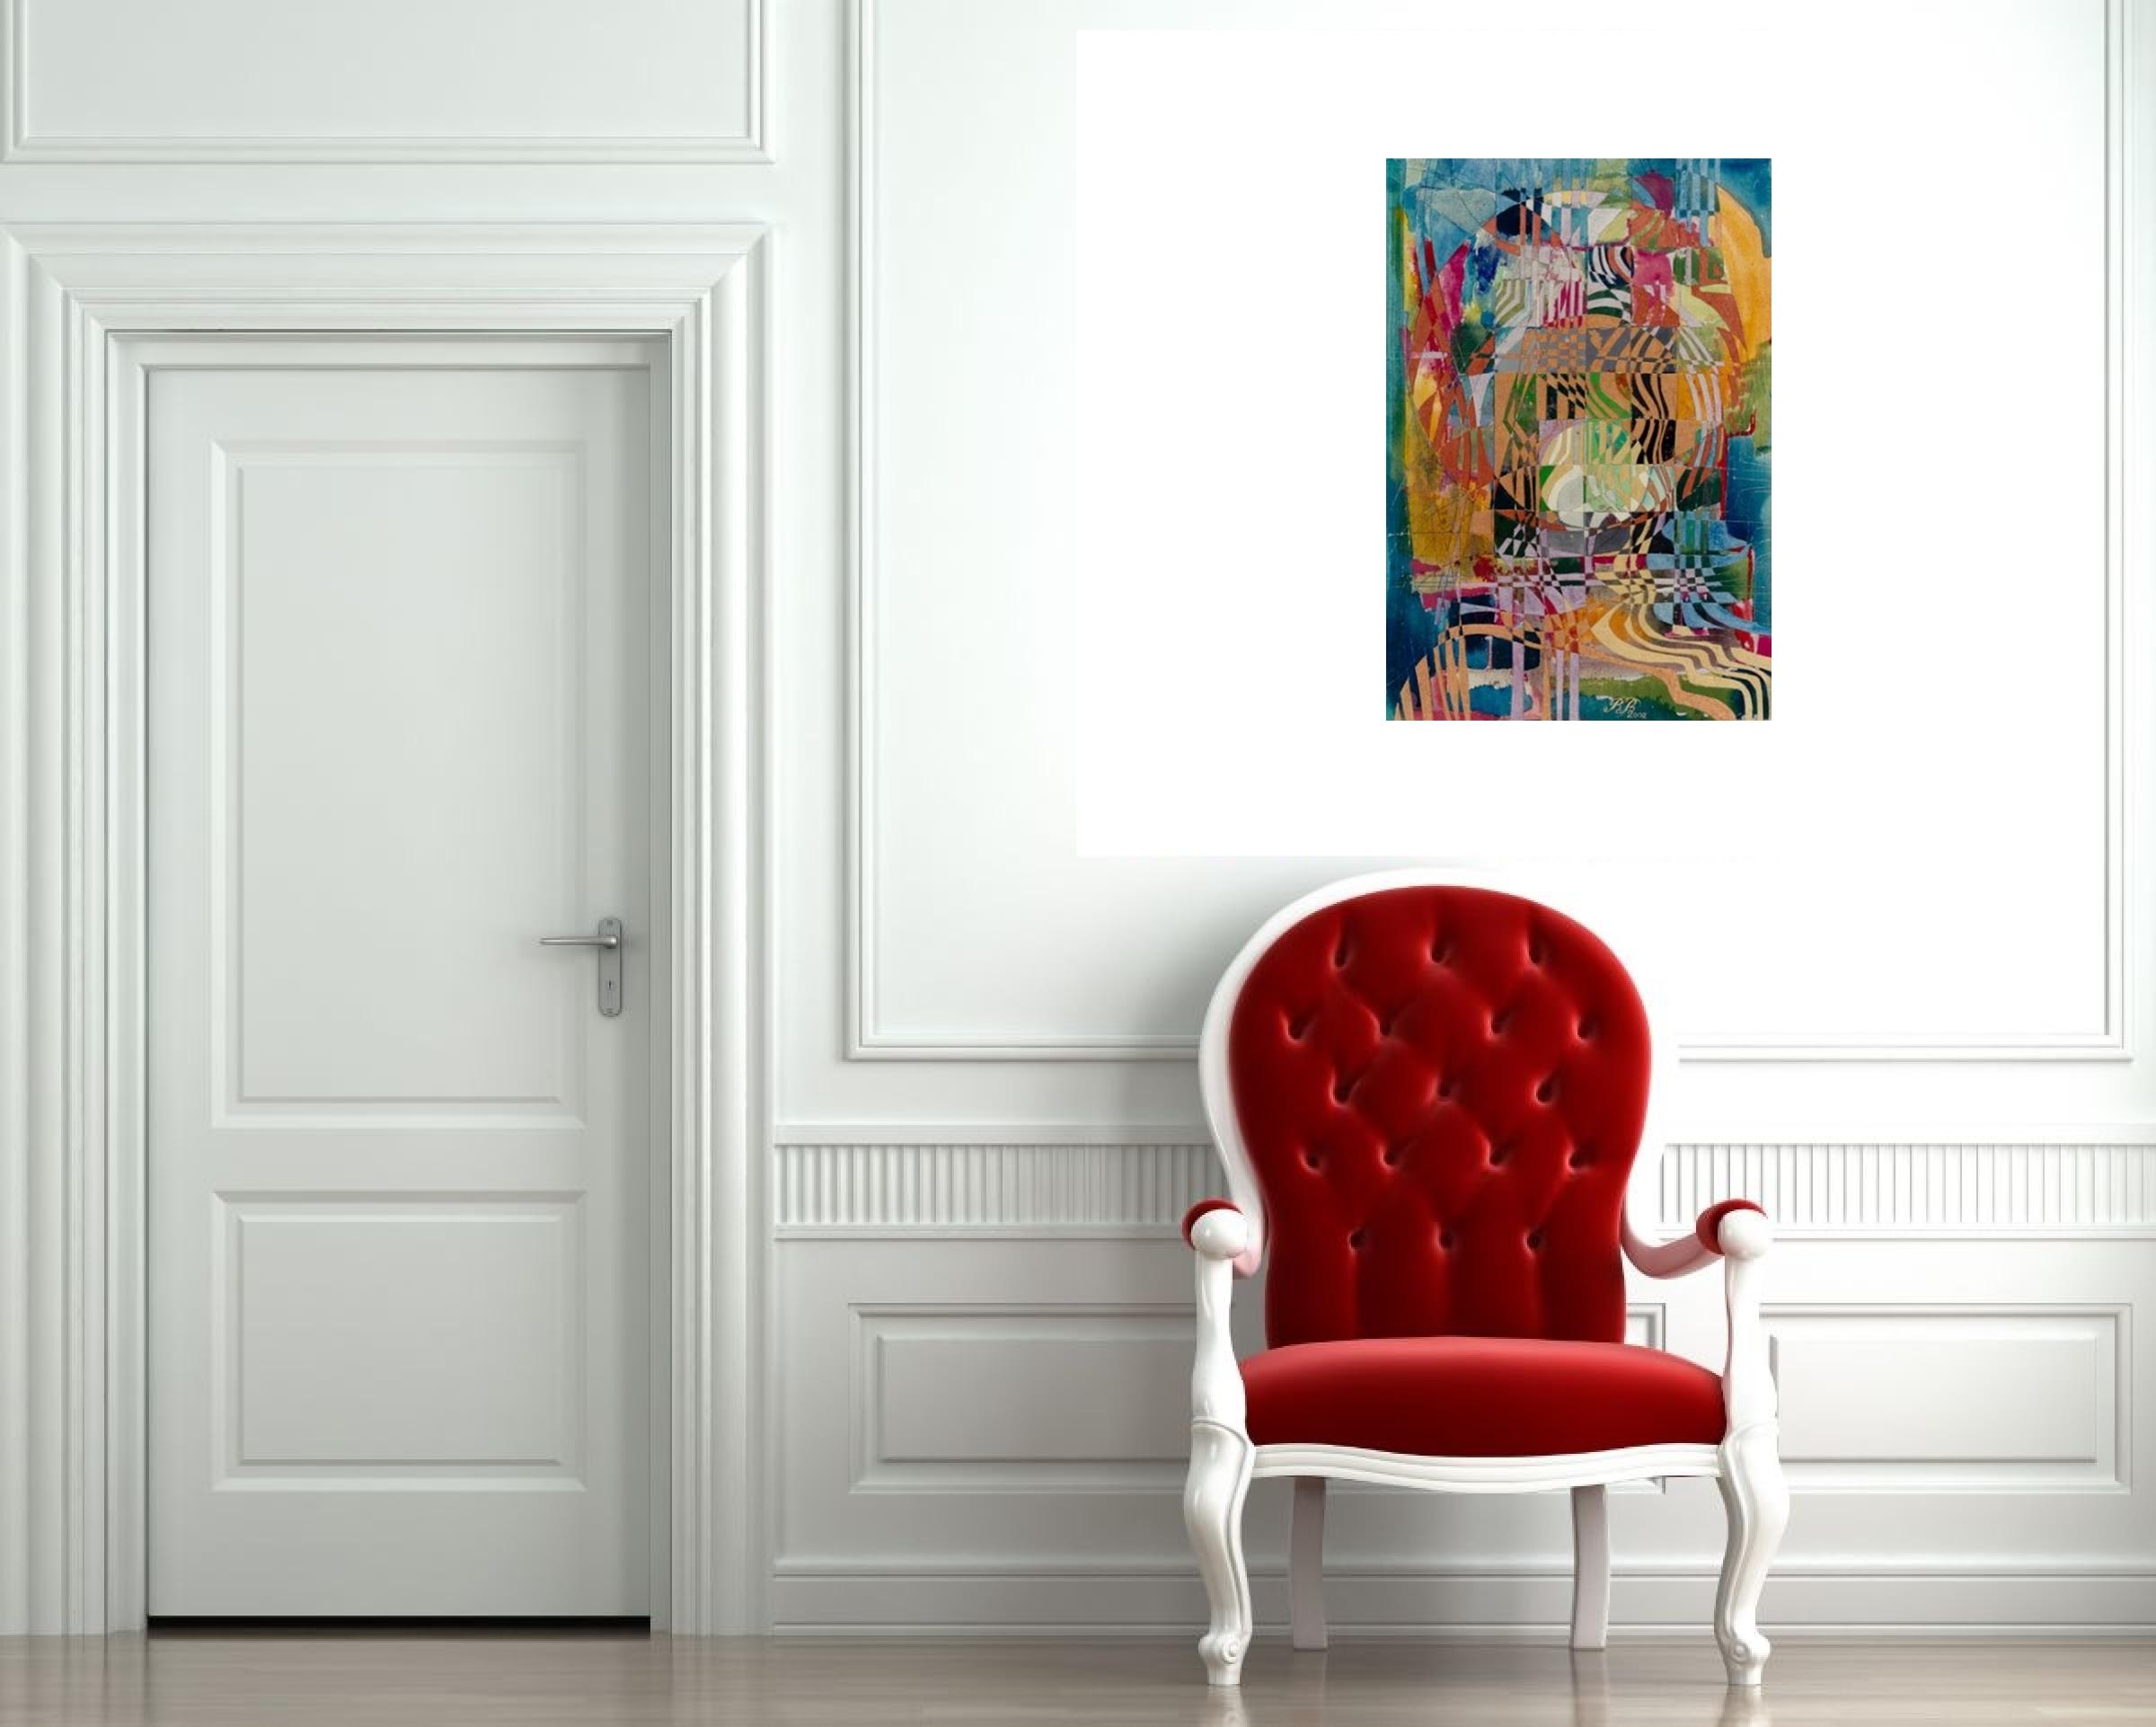 """The Bandaged Balloon"" Rumyanka Bozhkova Thematic Painting"